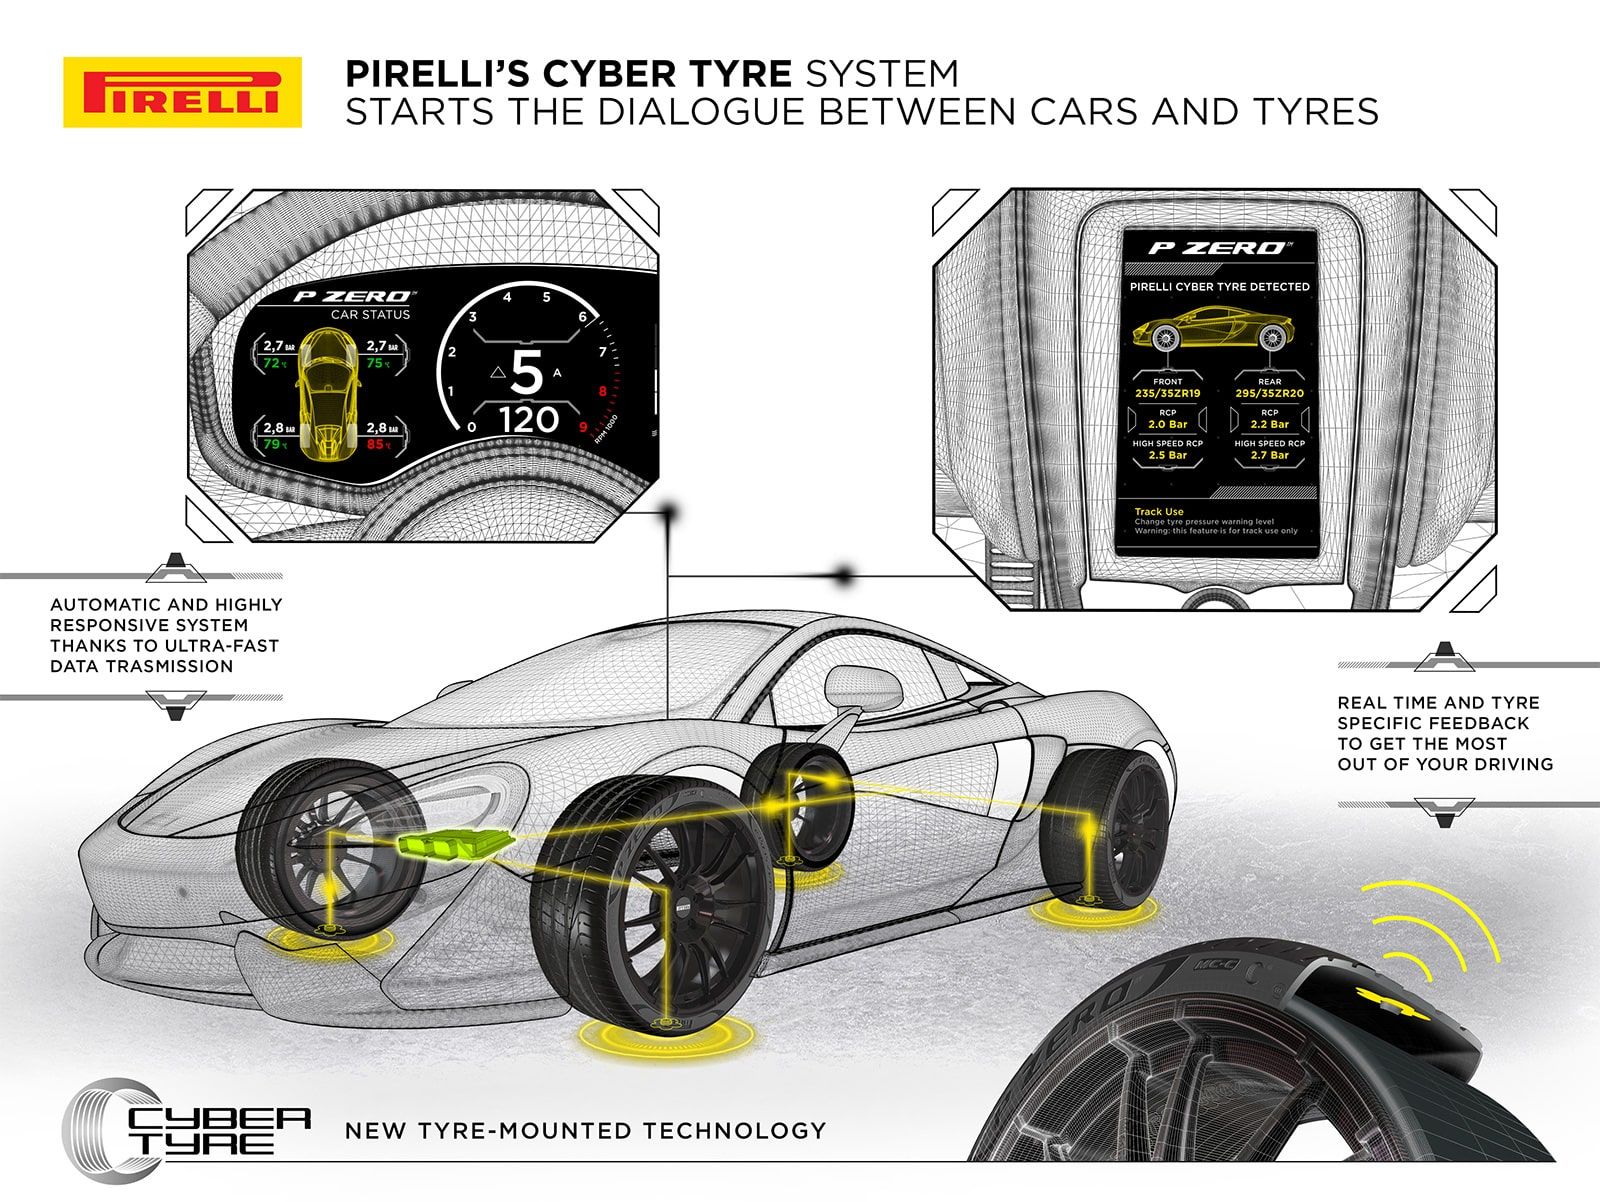 Pirelli Cyber Tyres